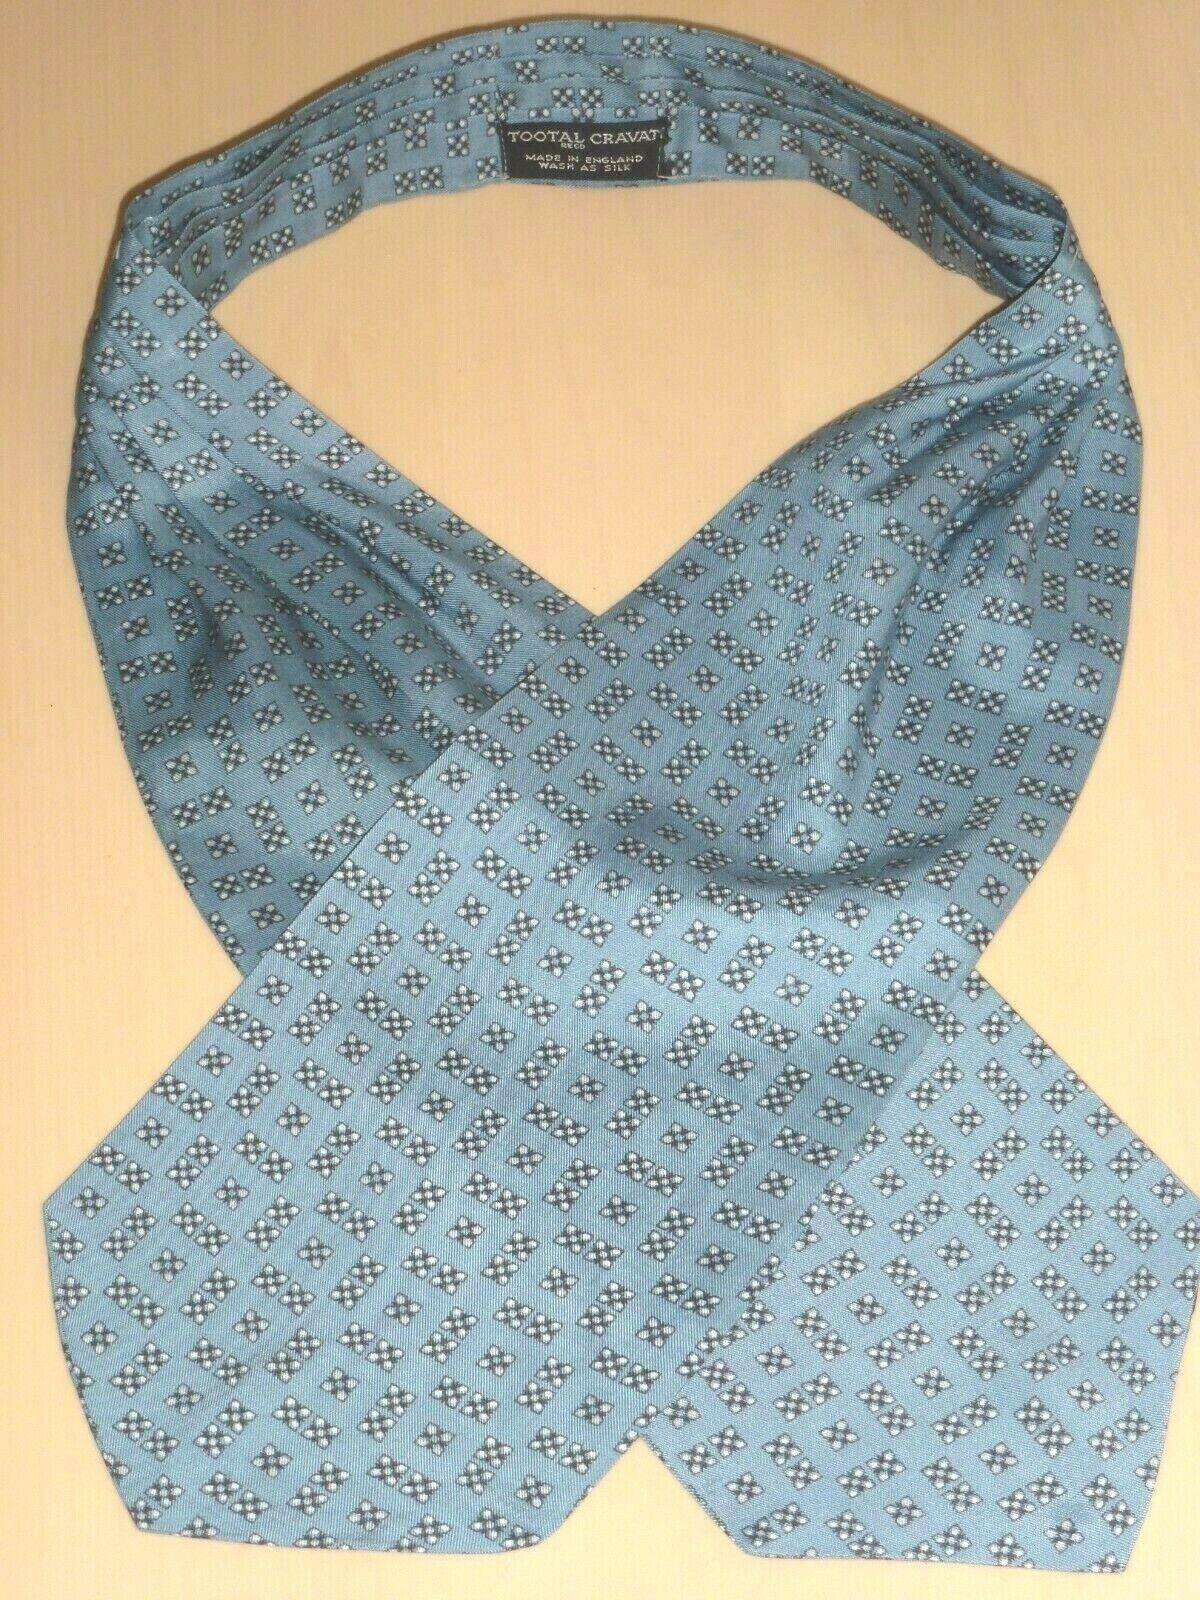 Vintage Tootal Cravat Scarf Dapper Mod Indie Goodwood Ascot Retro 1960s Menswear